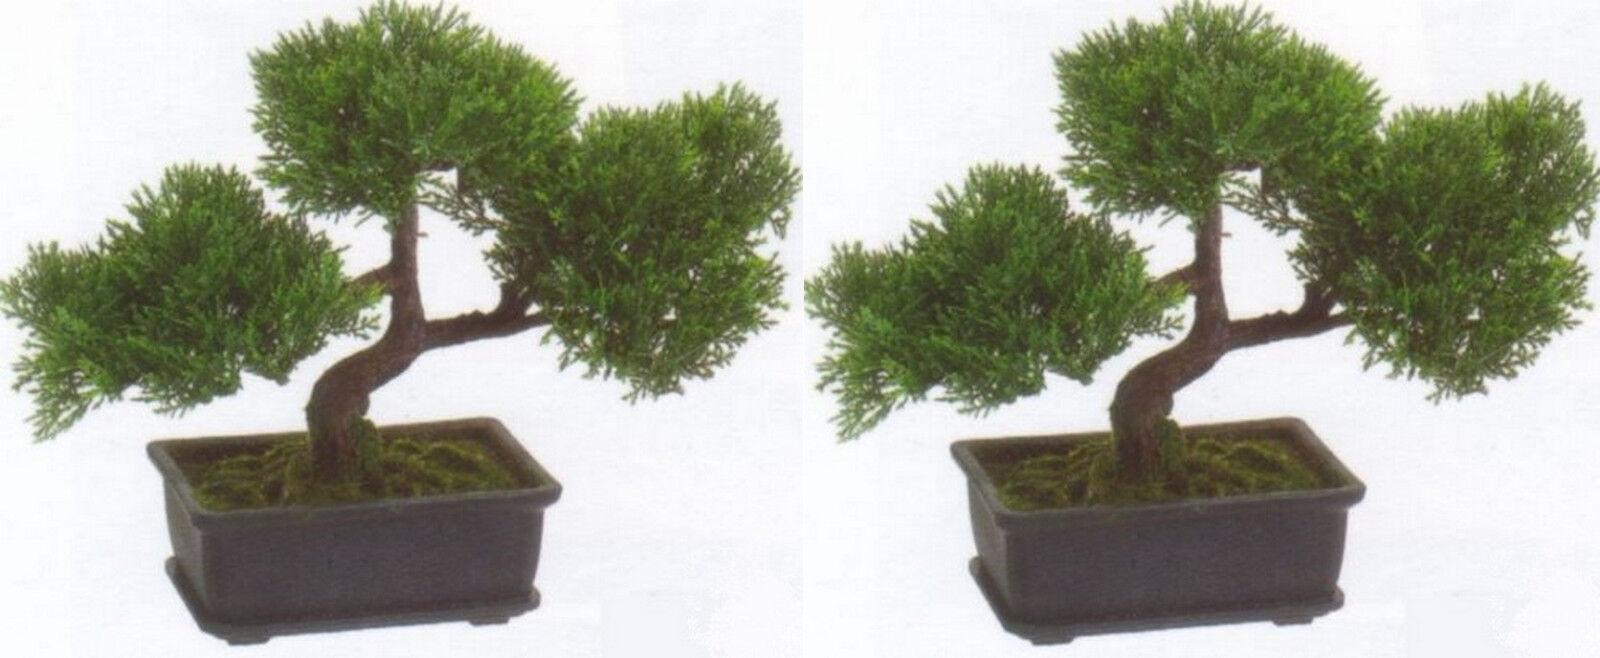 2 ARTIFICIAL 9  CEDAR BONSAI TREE TREE TREE TOPIARY IN OUTDOOR PLANT POOL PATIO HOME DECOR 287626